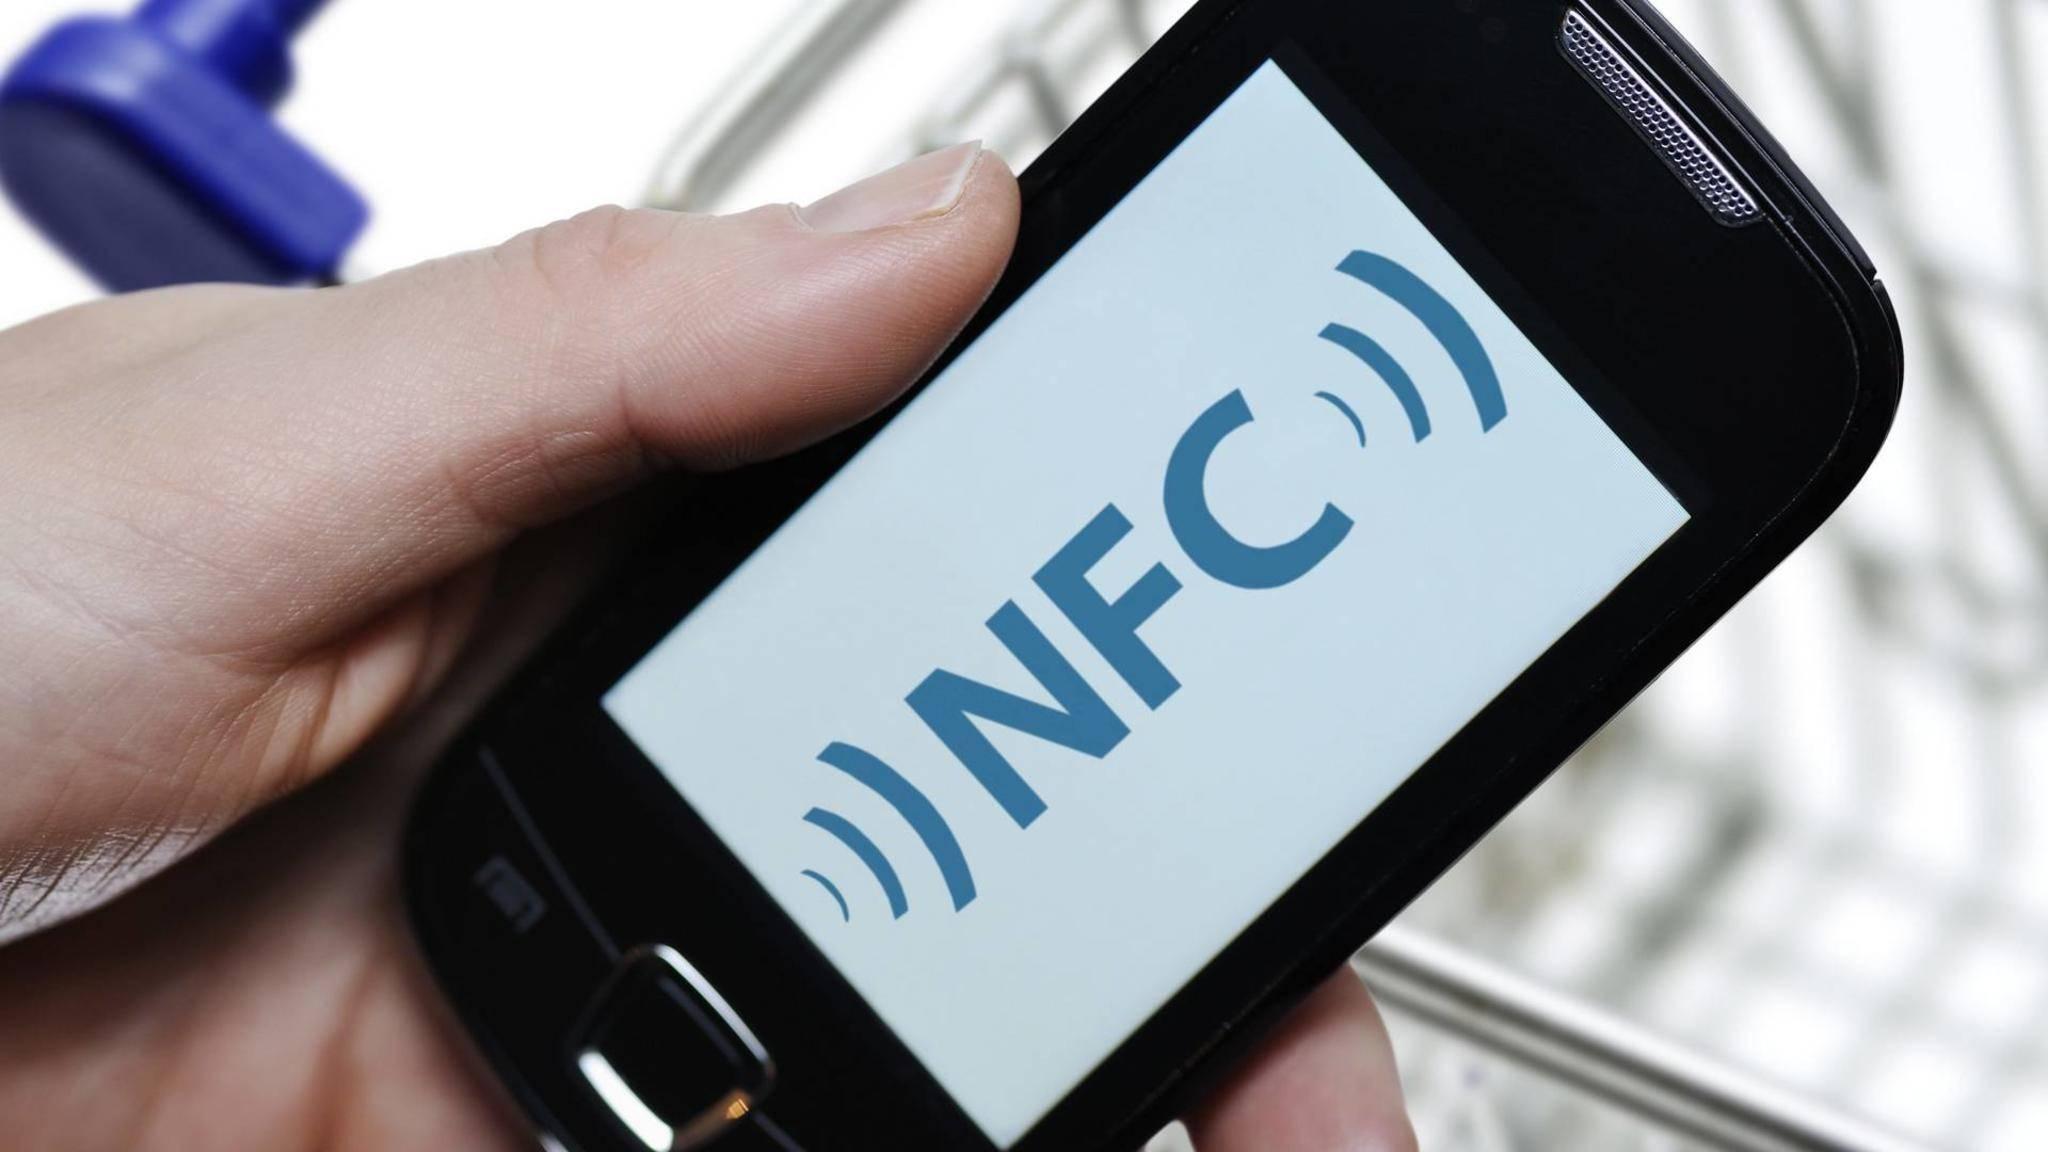 Dank NFC lassen sich mit dem Smartphone Kontakte teilen.